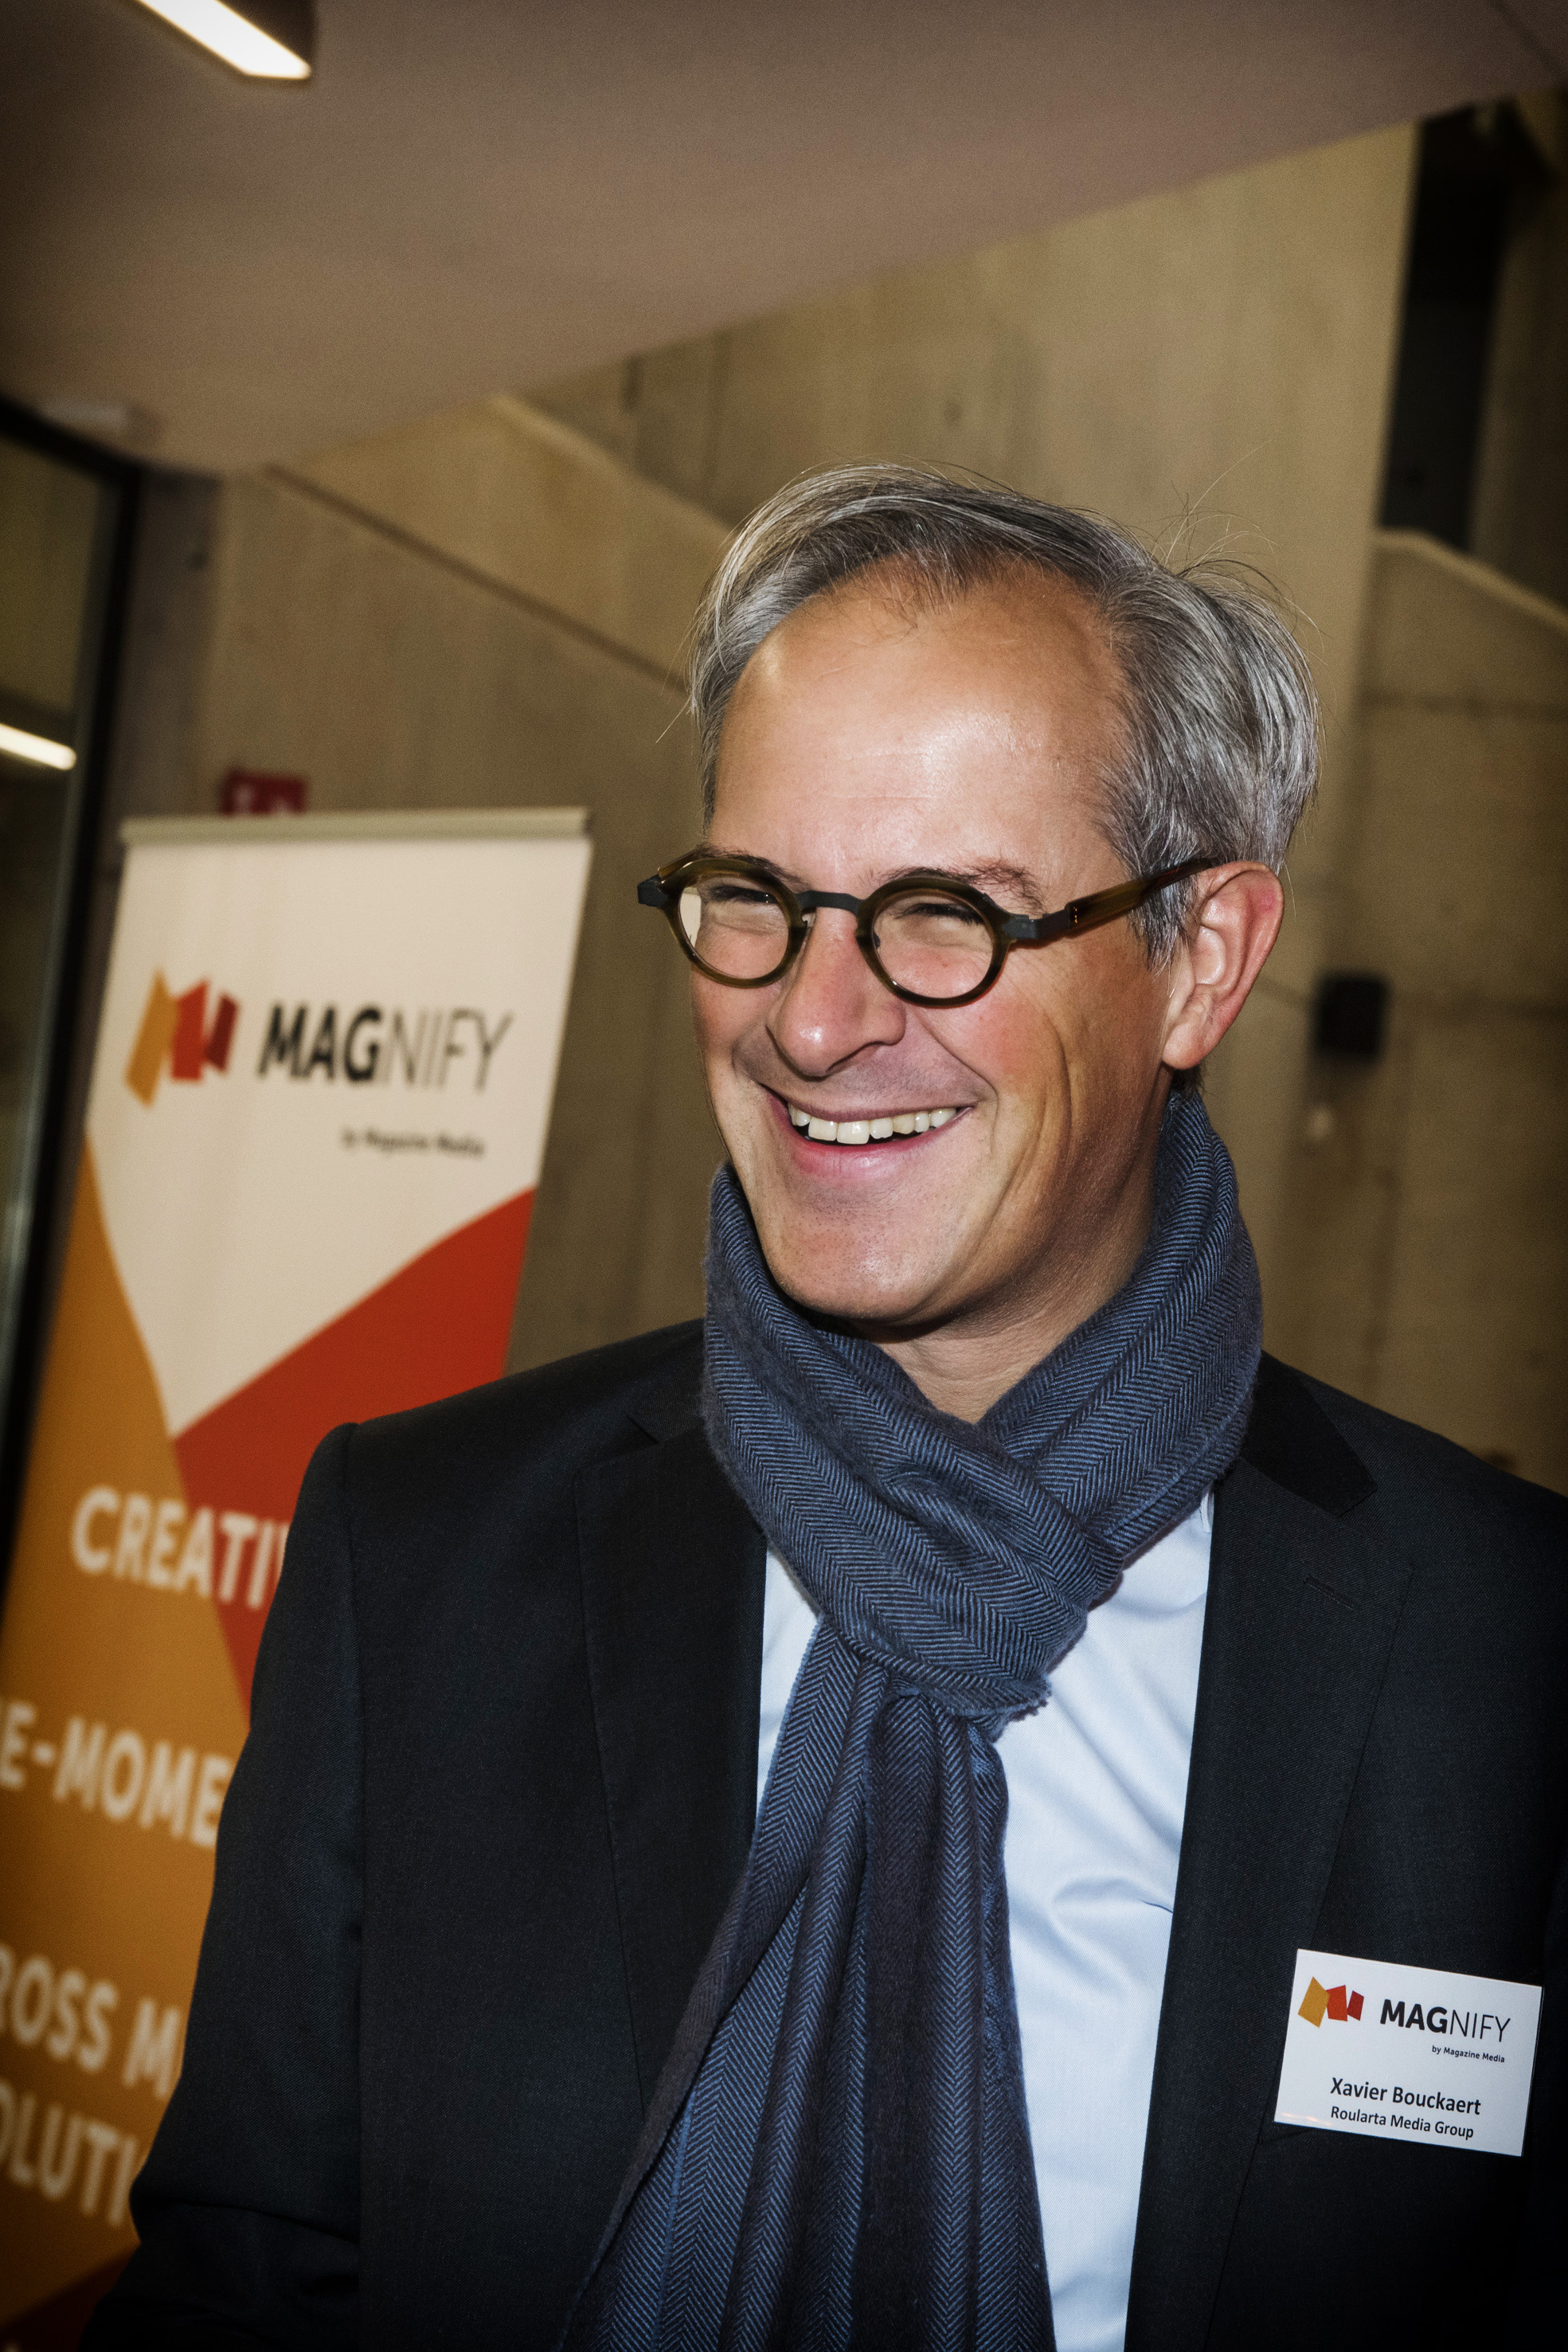 Xavier Bouckaert, Roularta Media Group